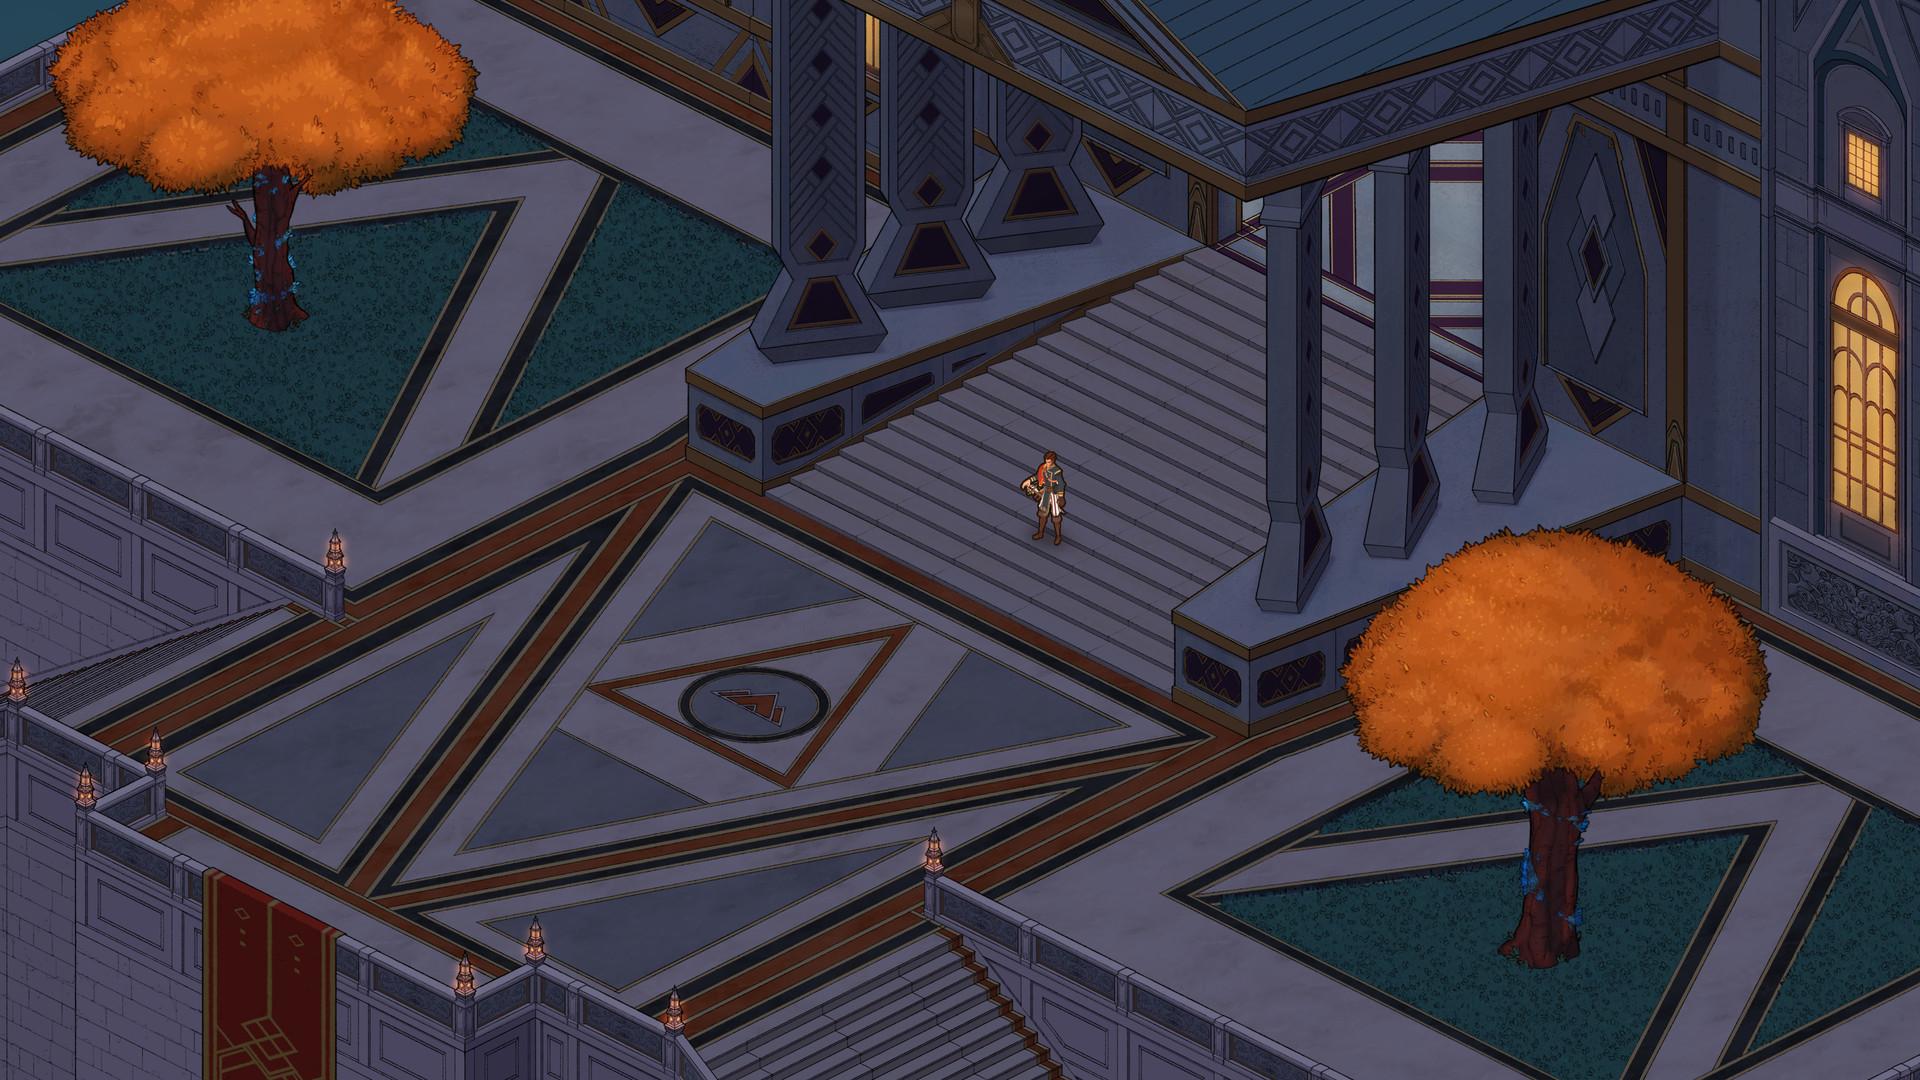 Dominic chan reg courtyard zoom